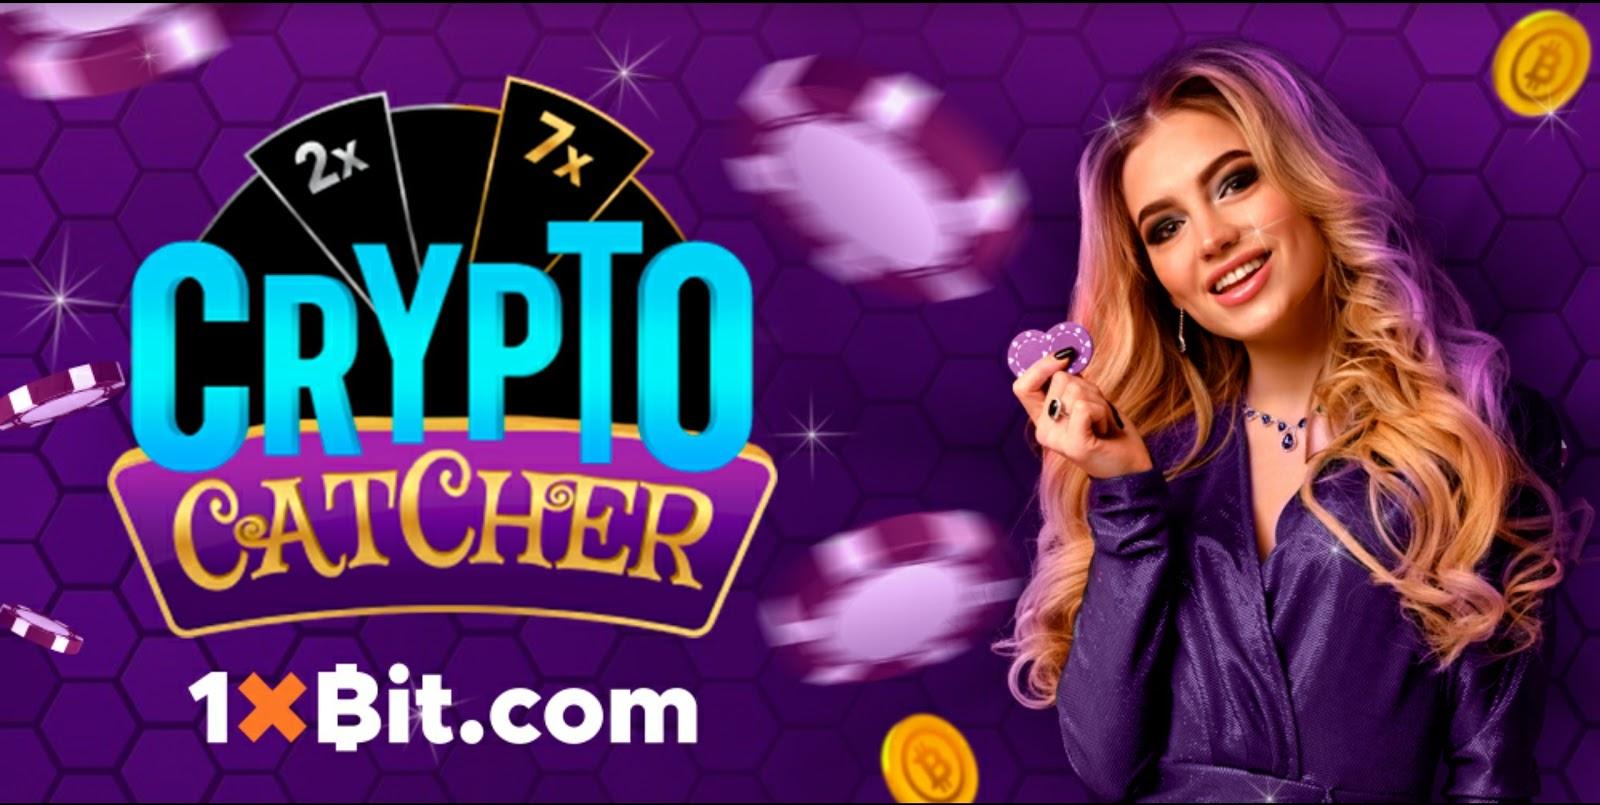 lady luck 1xbit casino